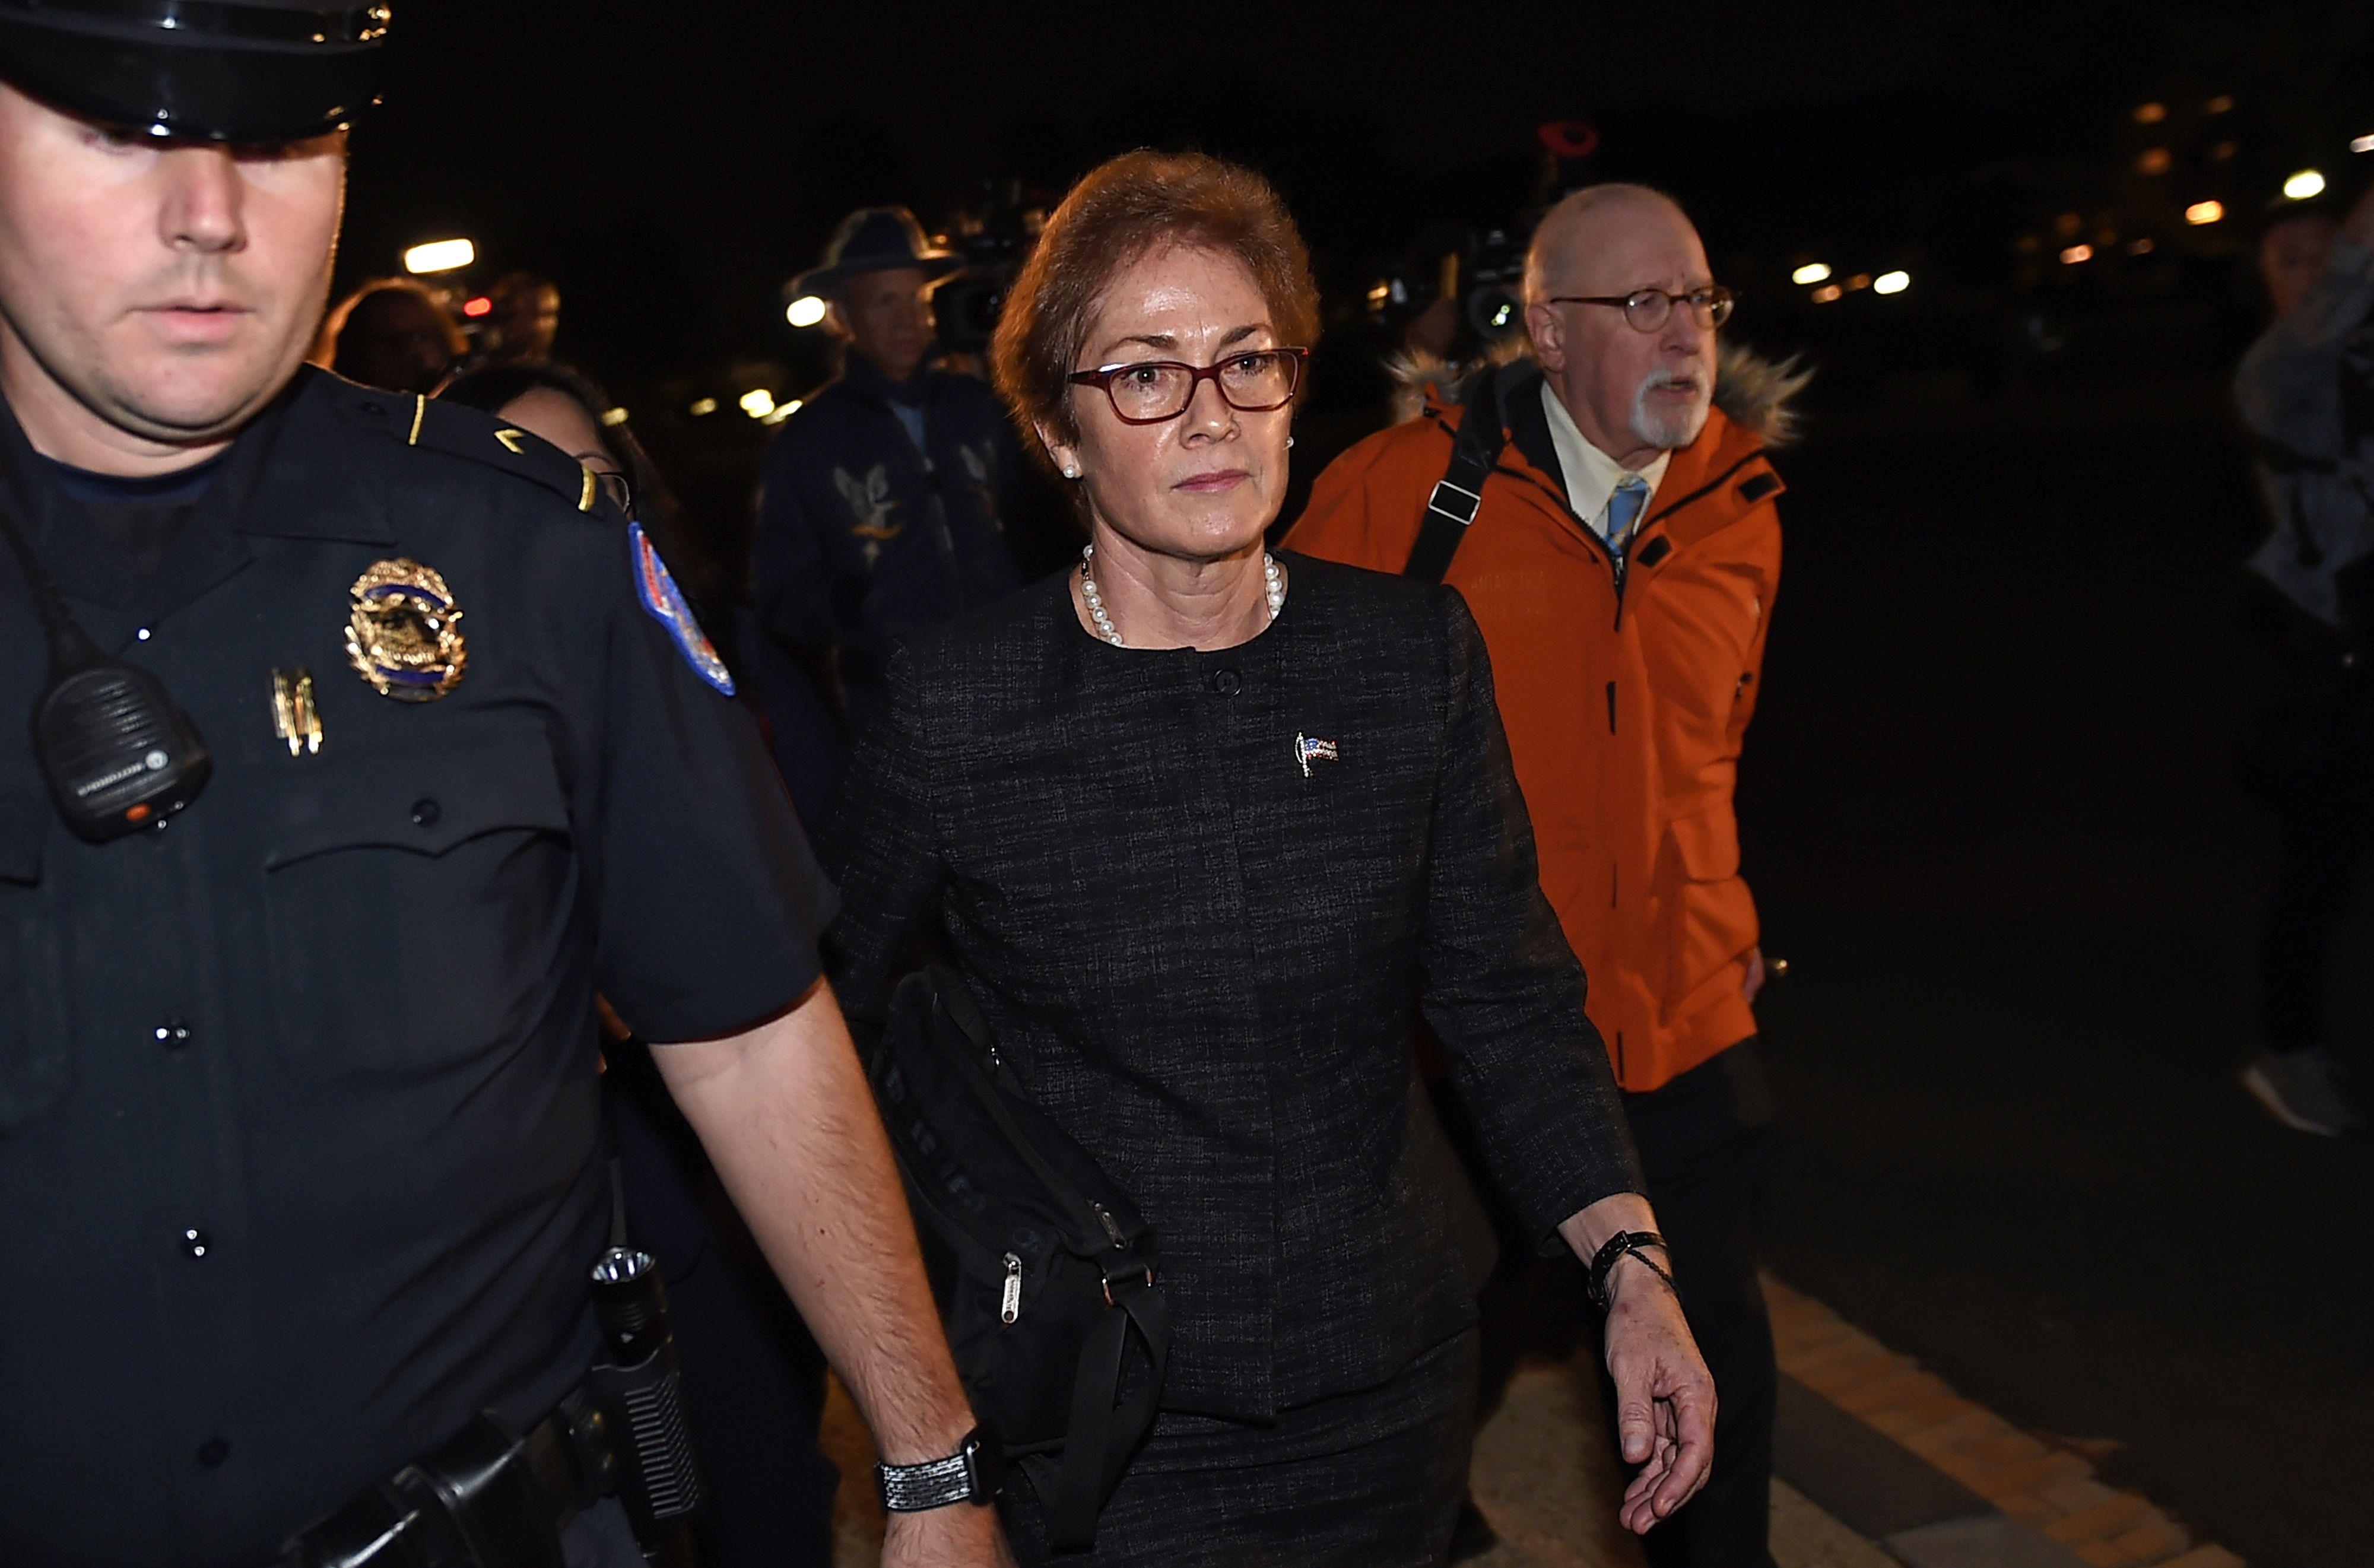 Former US Ambassador to Ukraine Marie Yovanovitch leaves the US Capitol October 11, 2019 in Washington, DC.